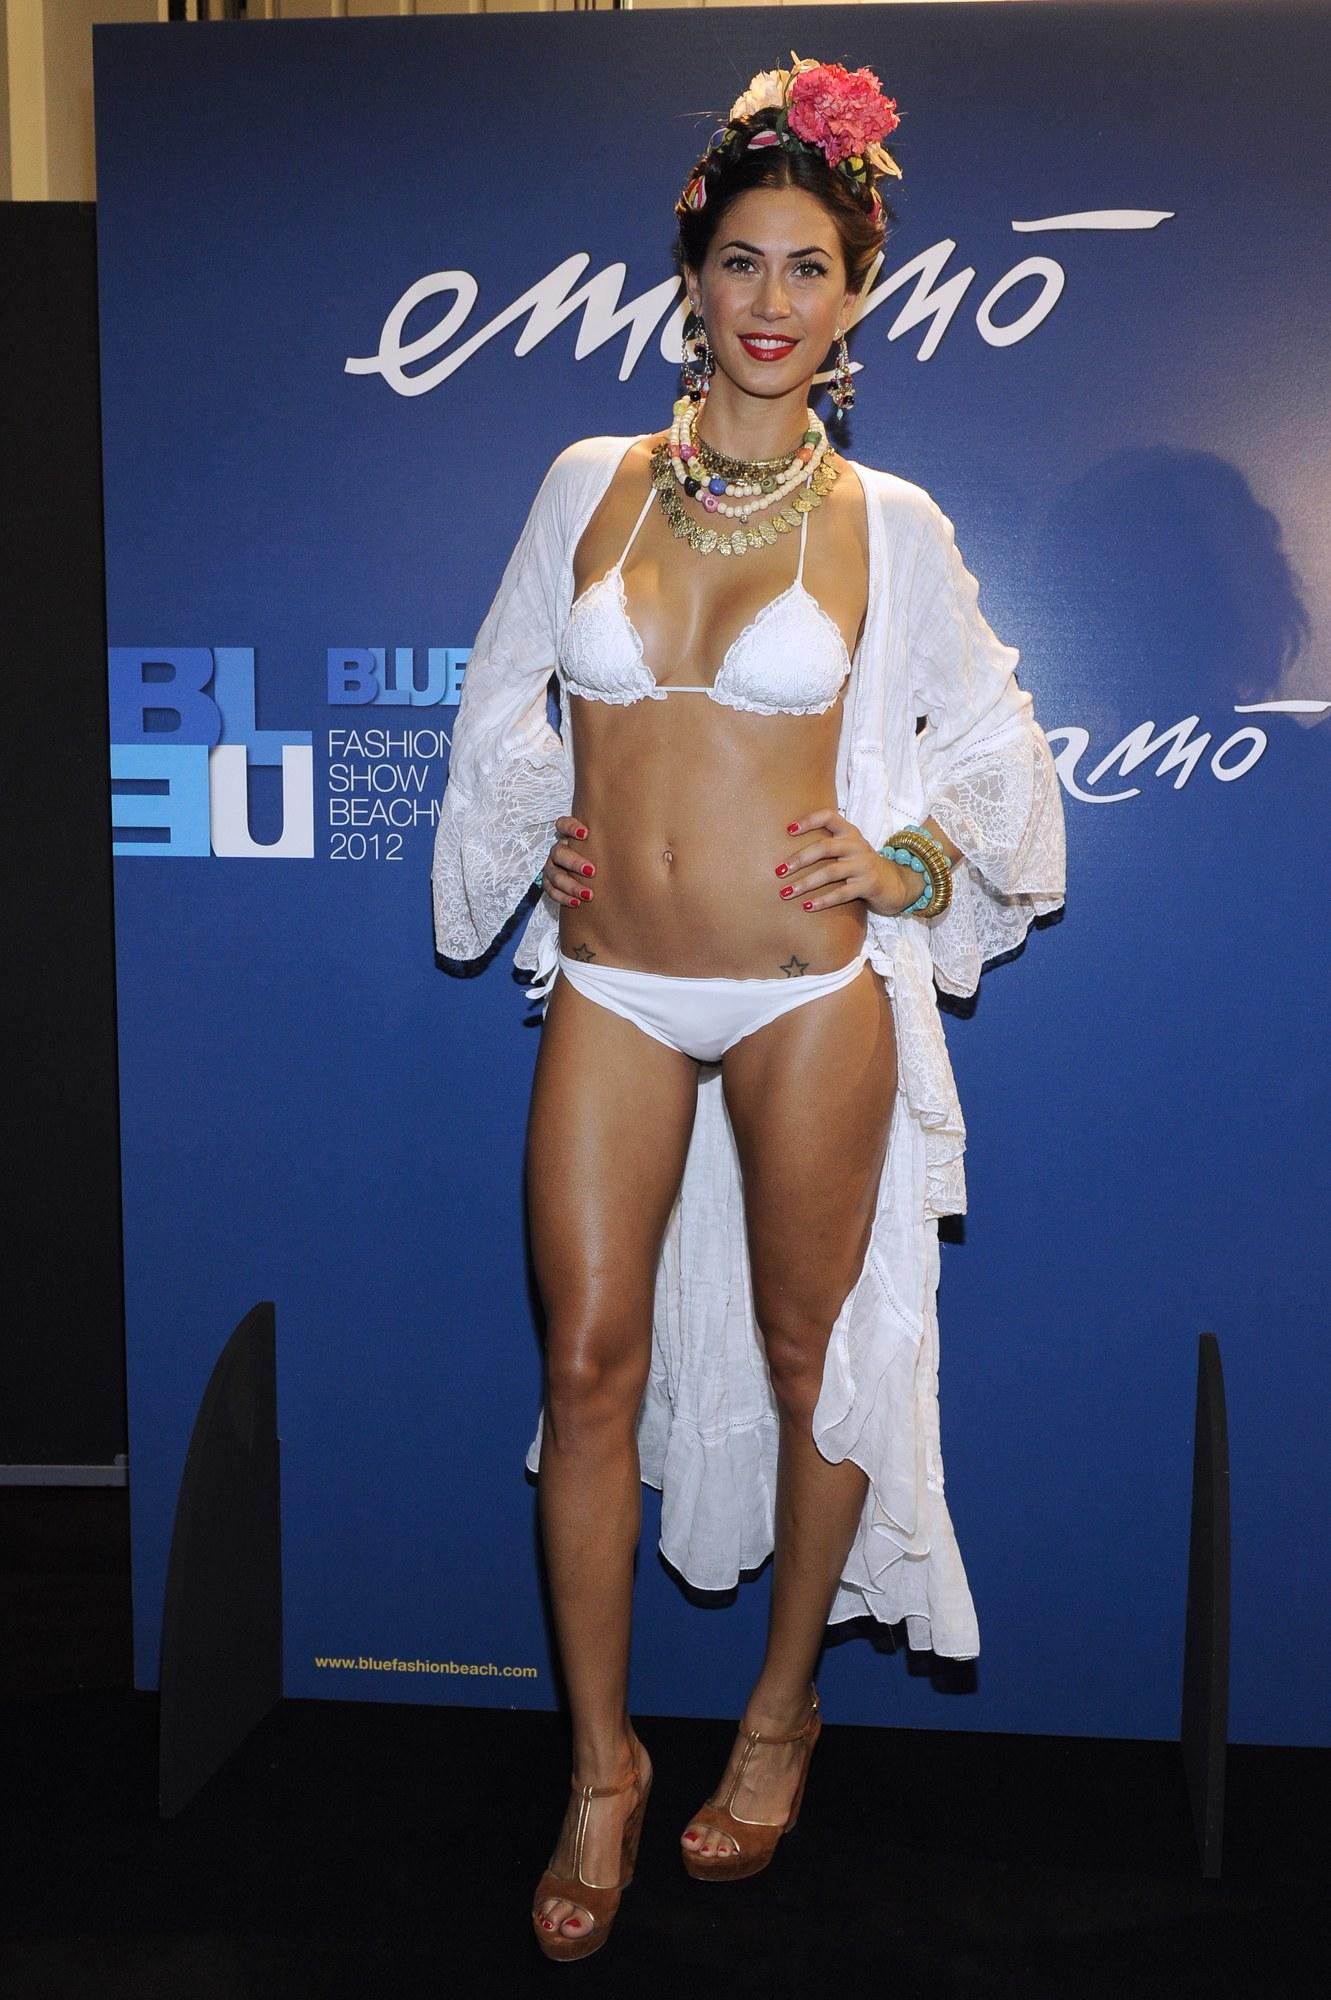 Melissa Satta Bikini Candids For Emamo 11 Gotceleb